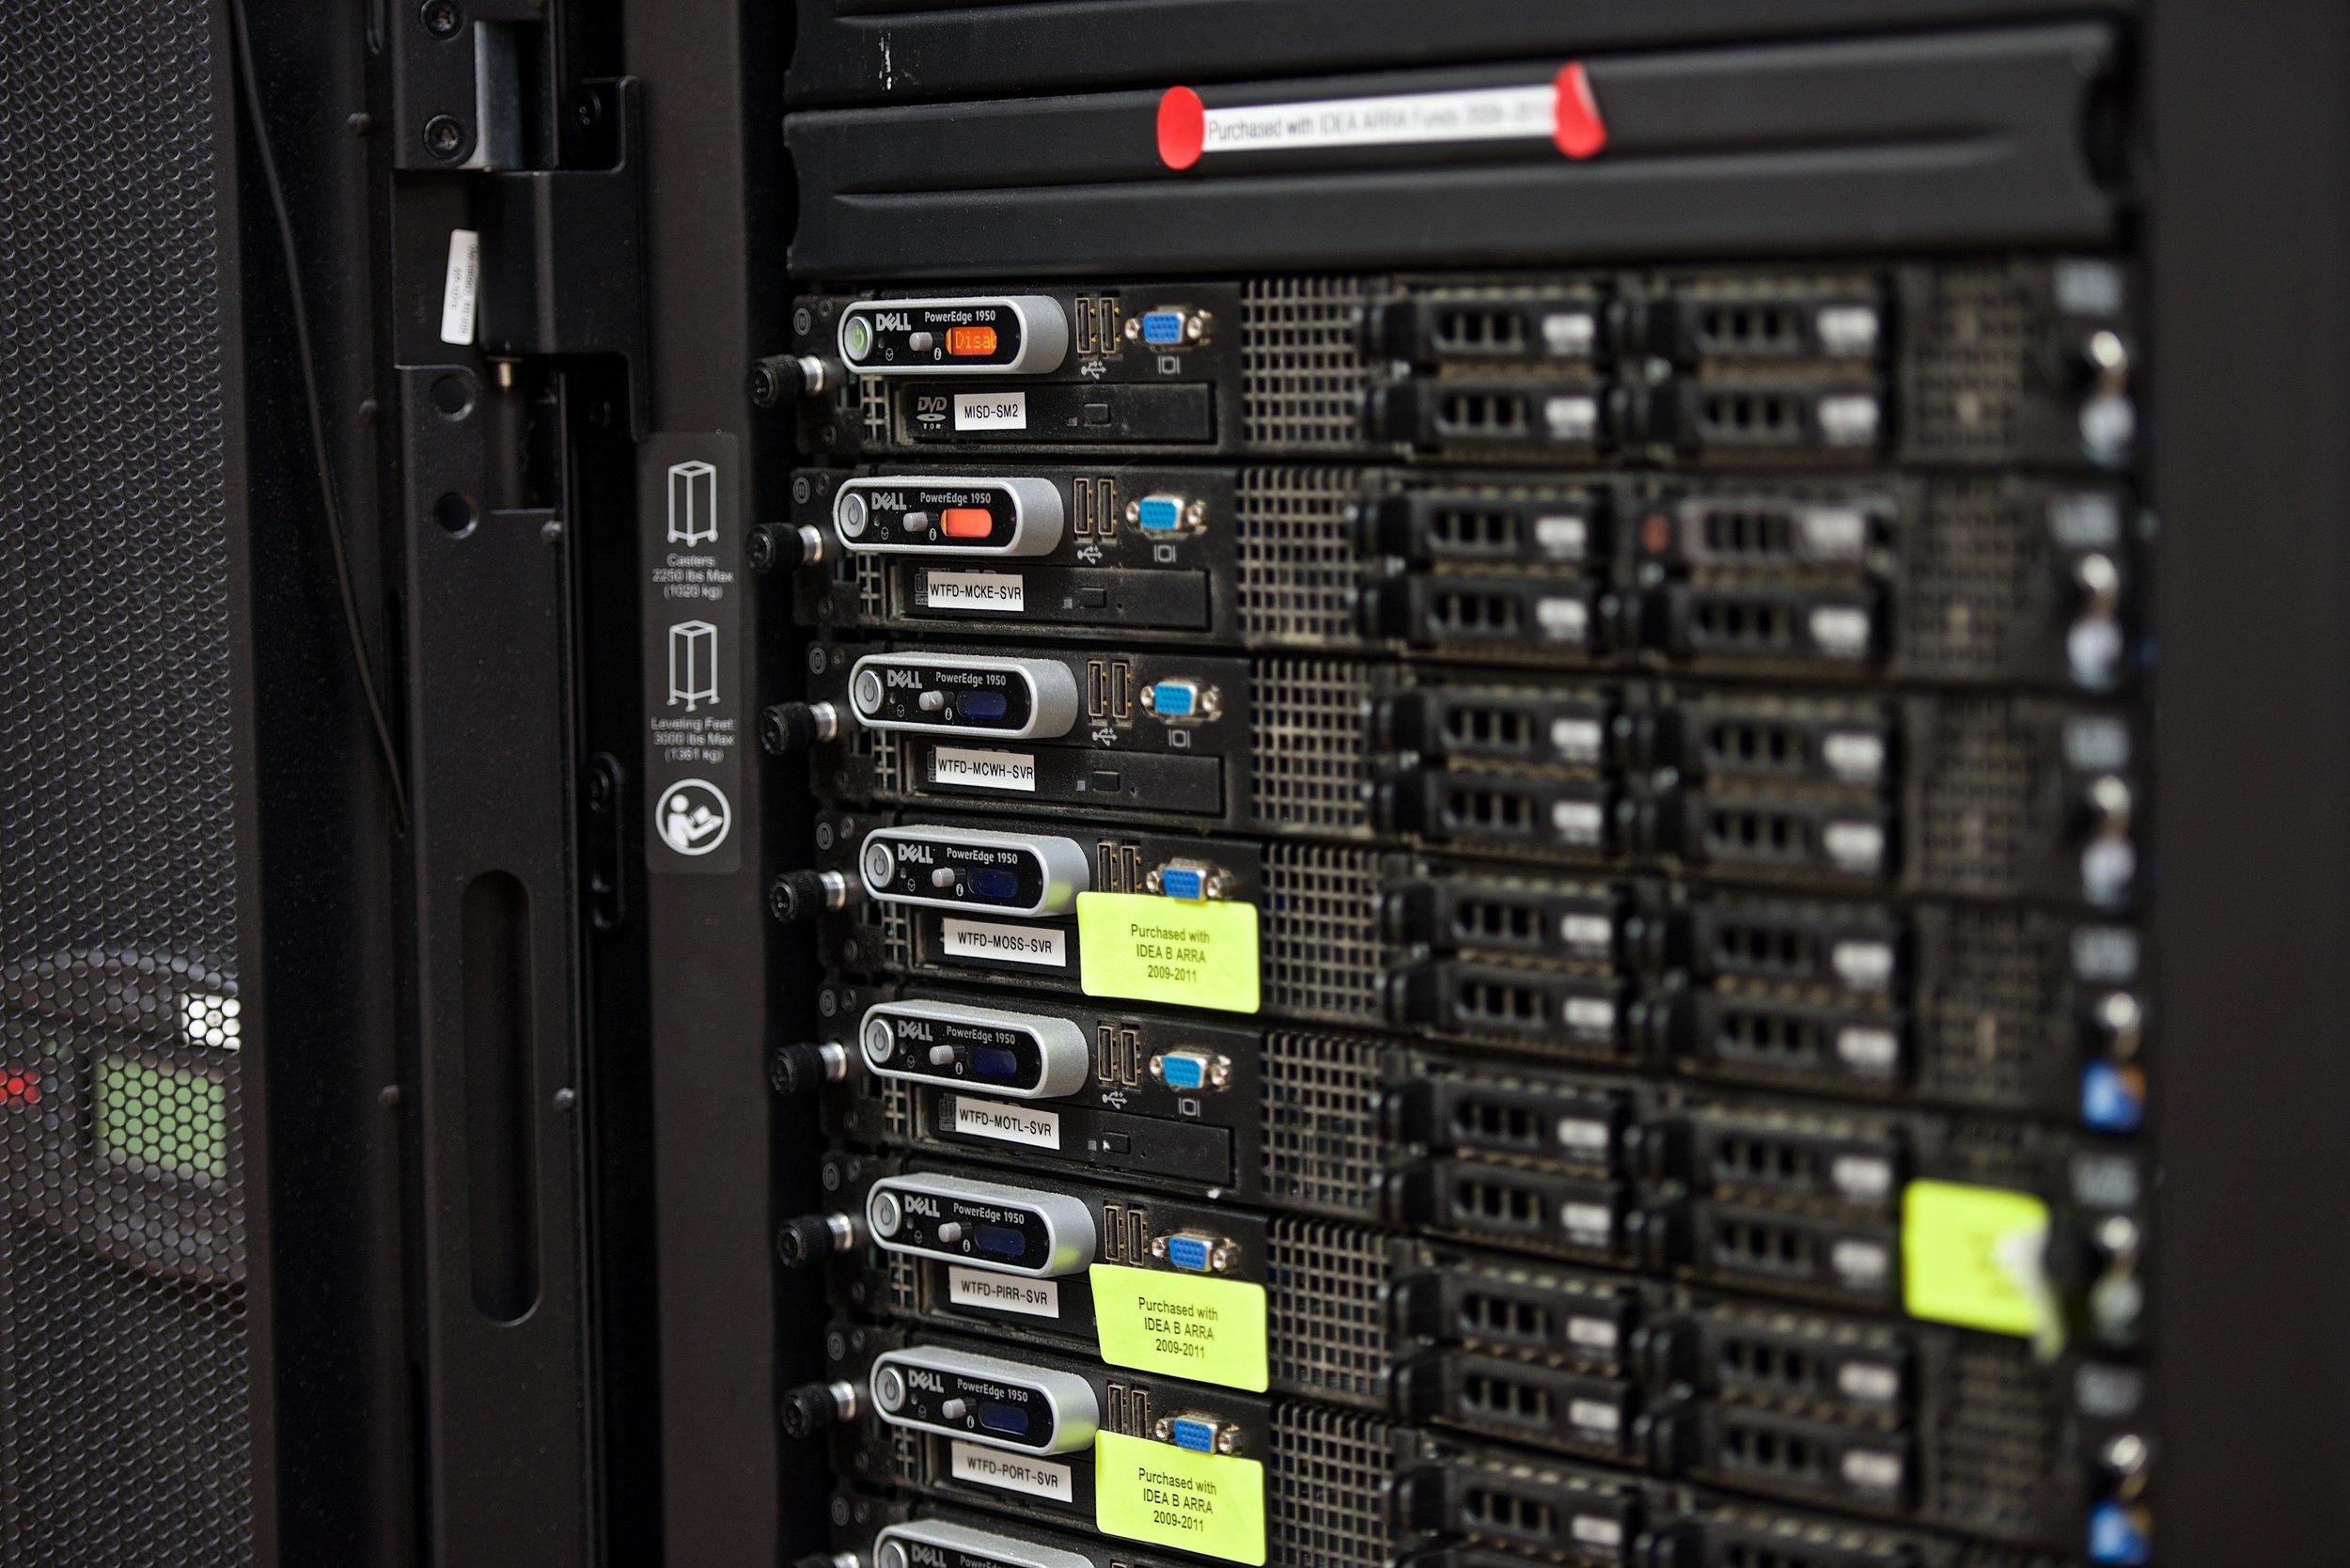 MesqISD 2015 ServerRm 9075-holmberg.jpg